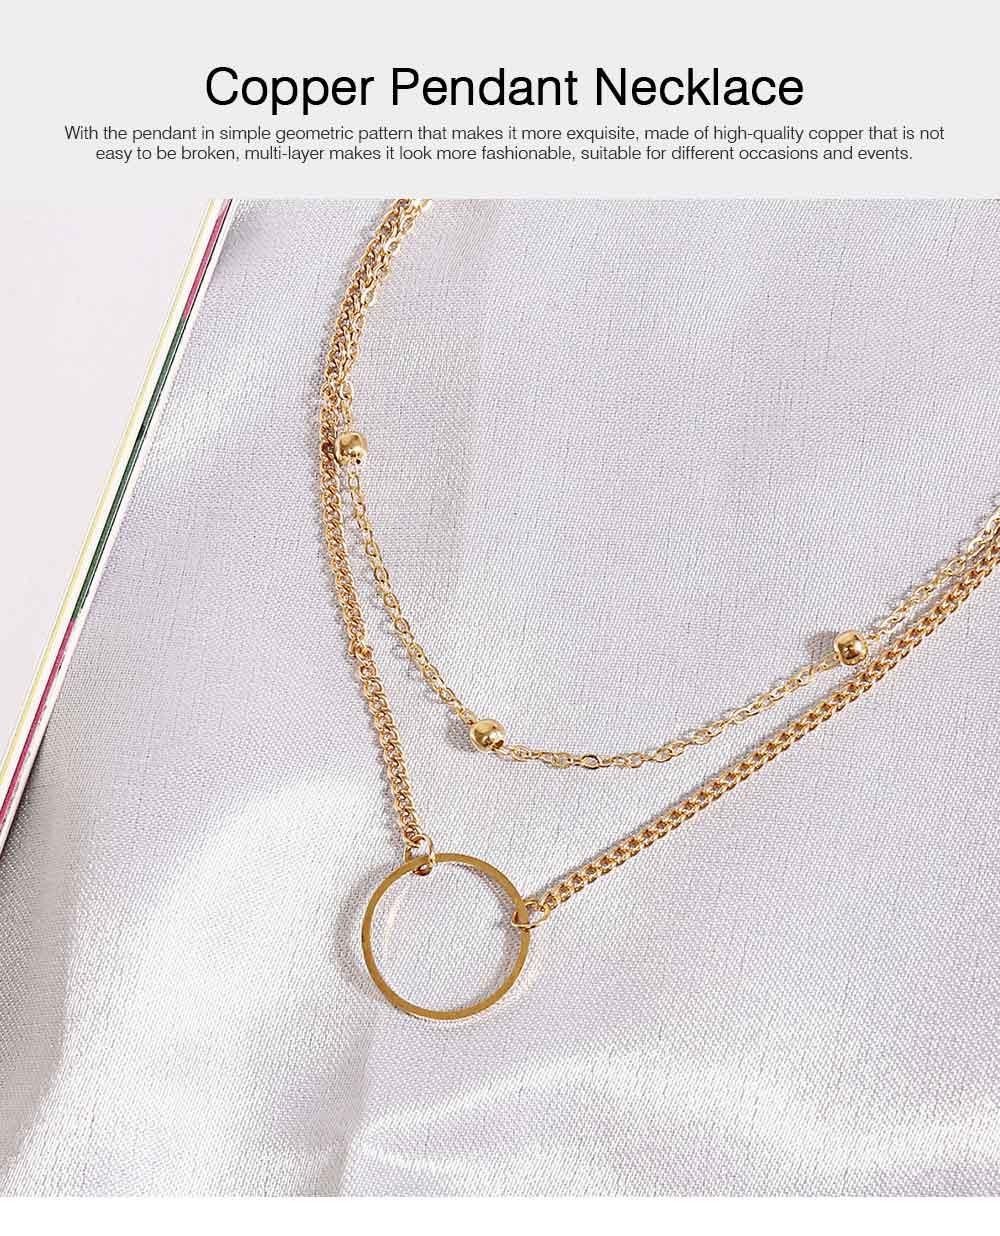 Geometric Copper Pendant Necklace, Multi-layer Simple Elegant Necklace Golden Alloy Neck Accessory 0